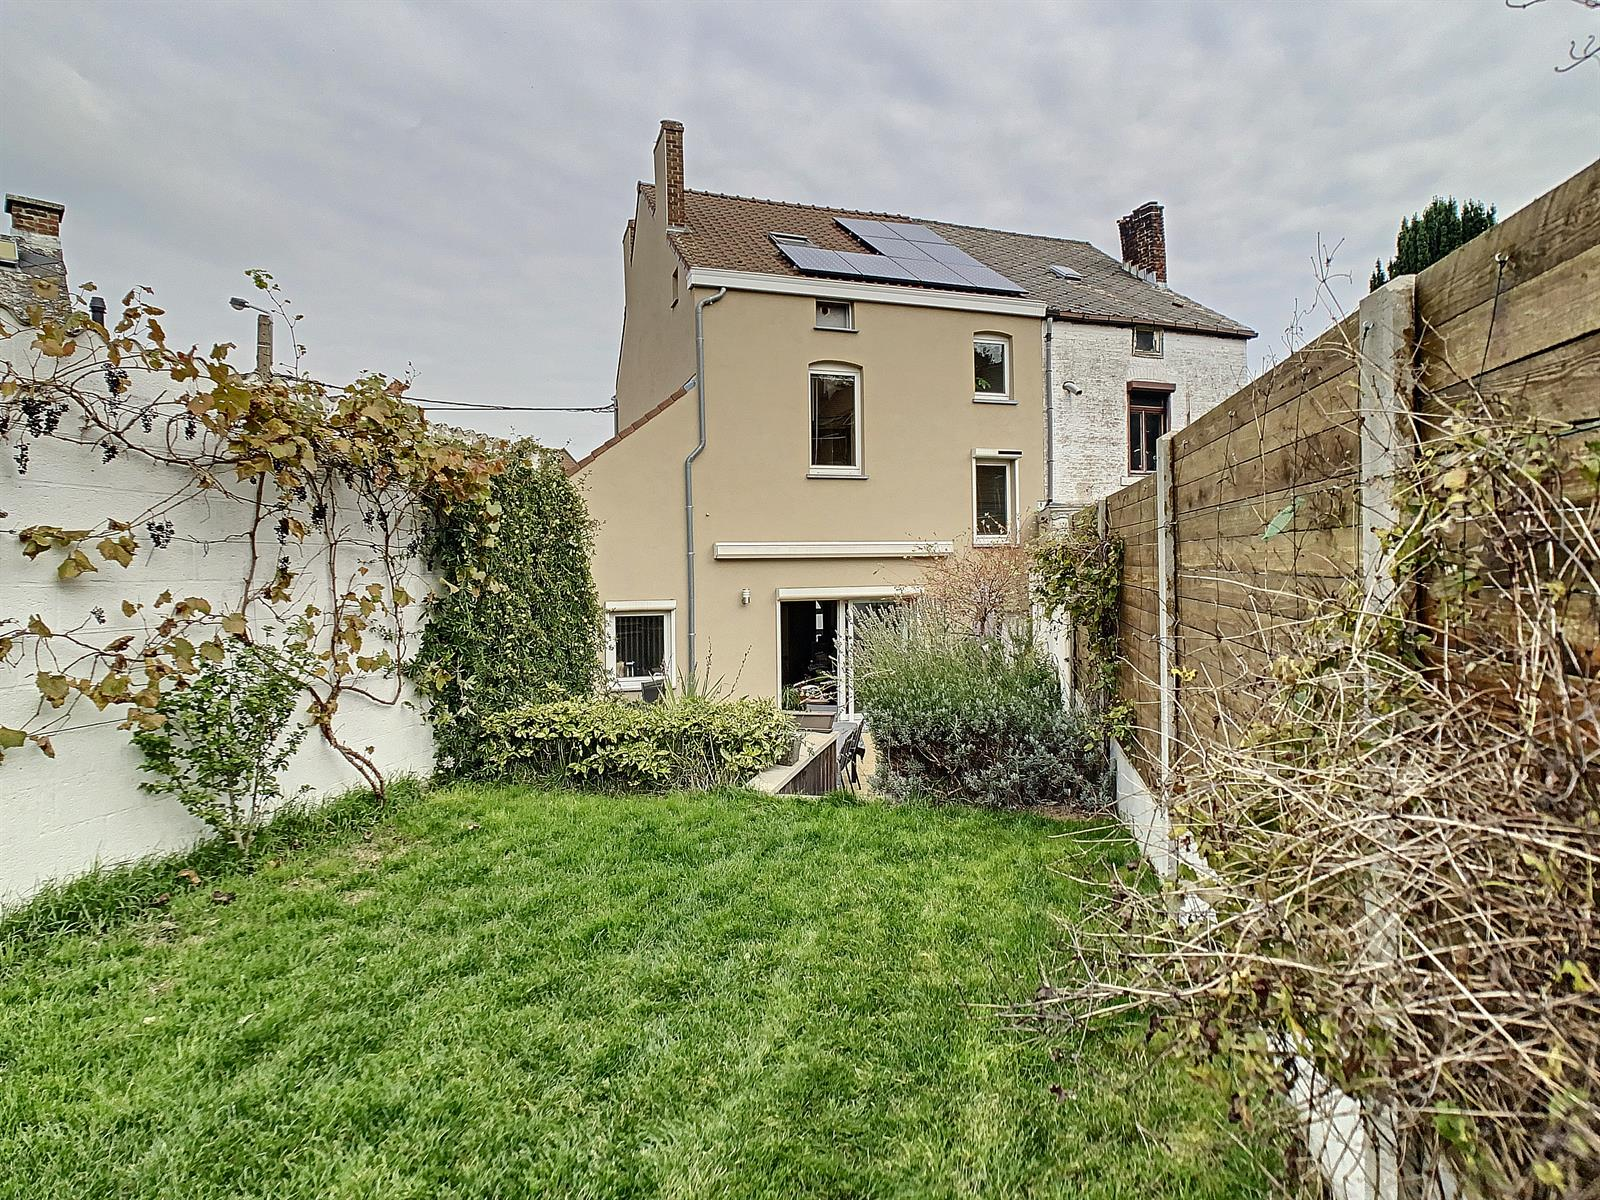 Maison - Charleroi Montsur-Marchienne - #4186318-18